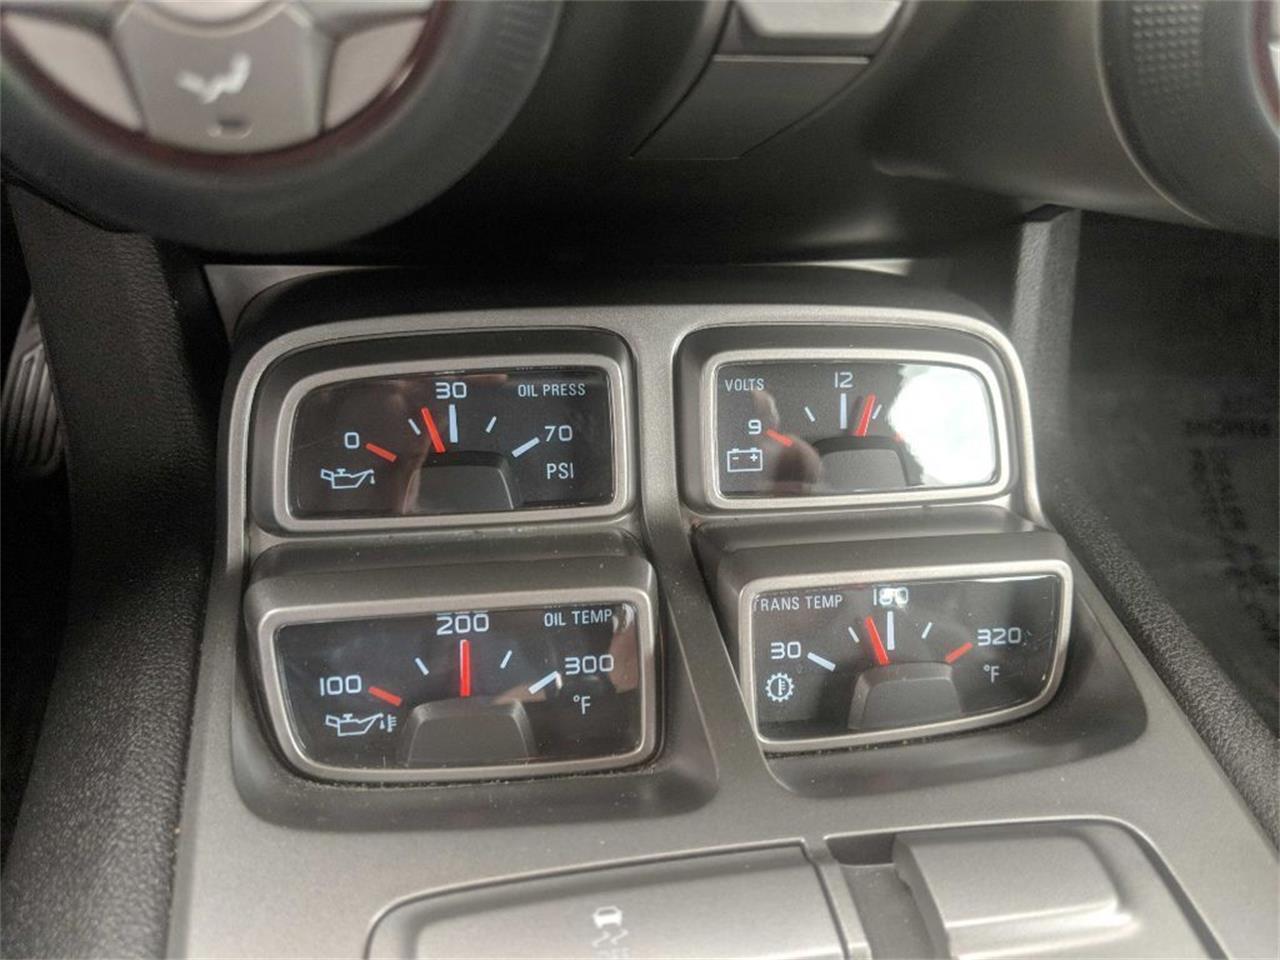 2010 Chevrolet Camaro (CC-1388951) for sale in Spirit Lake, Iowa